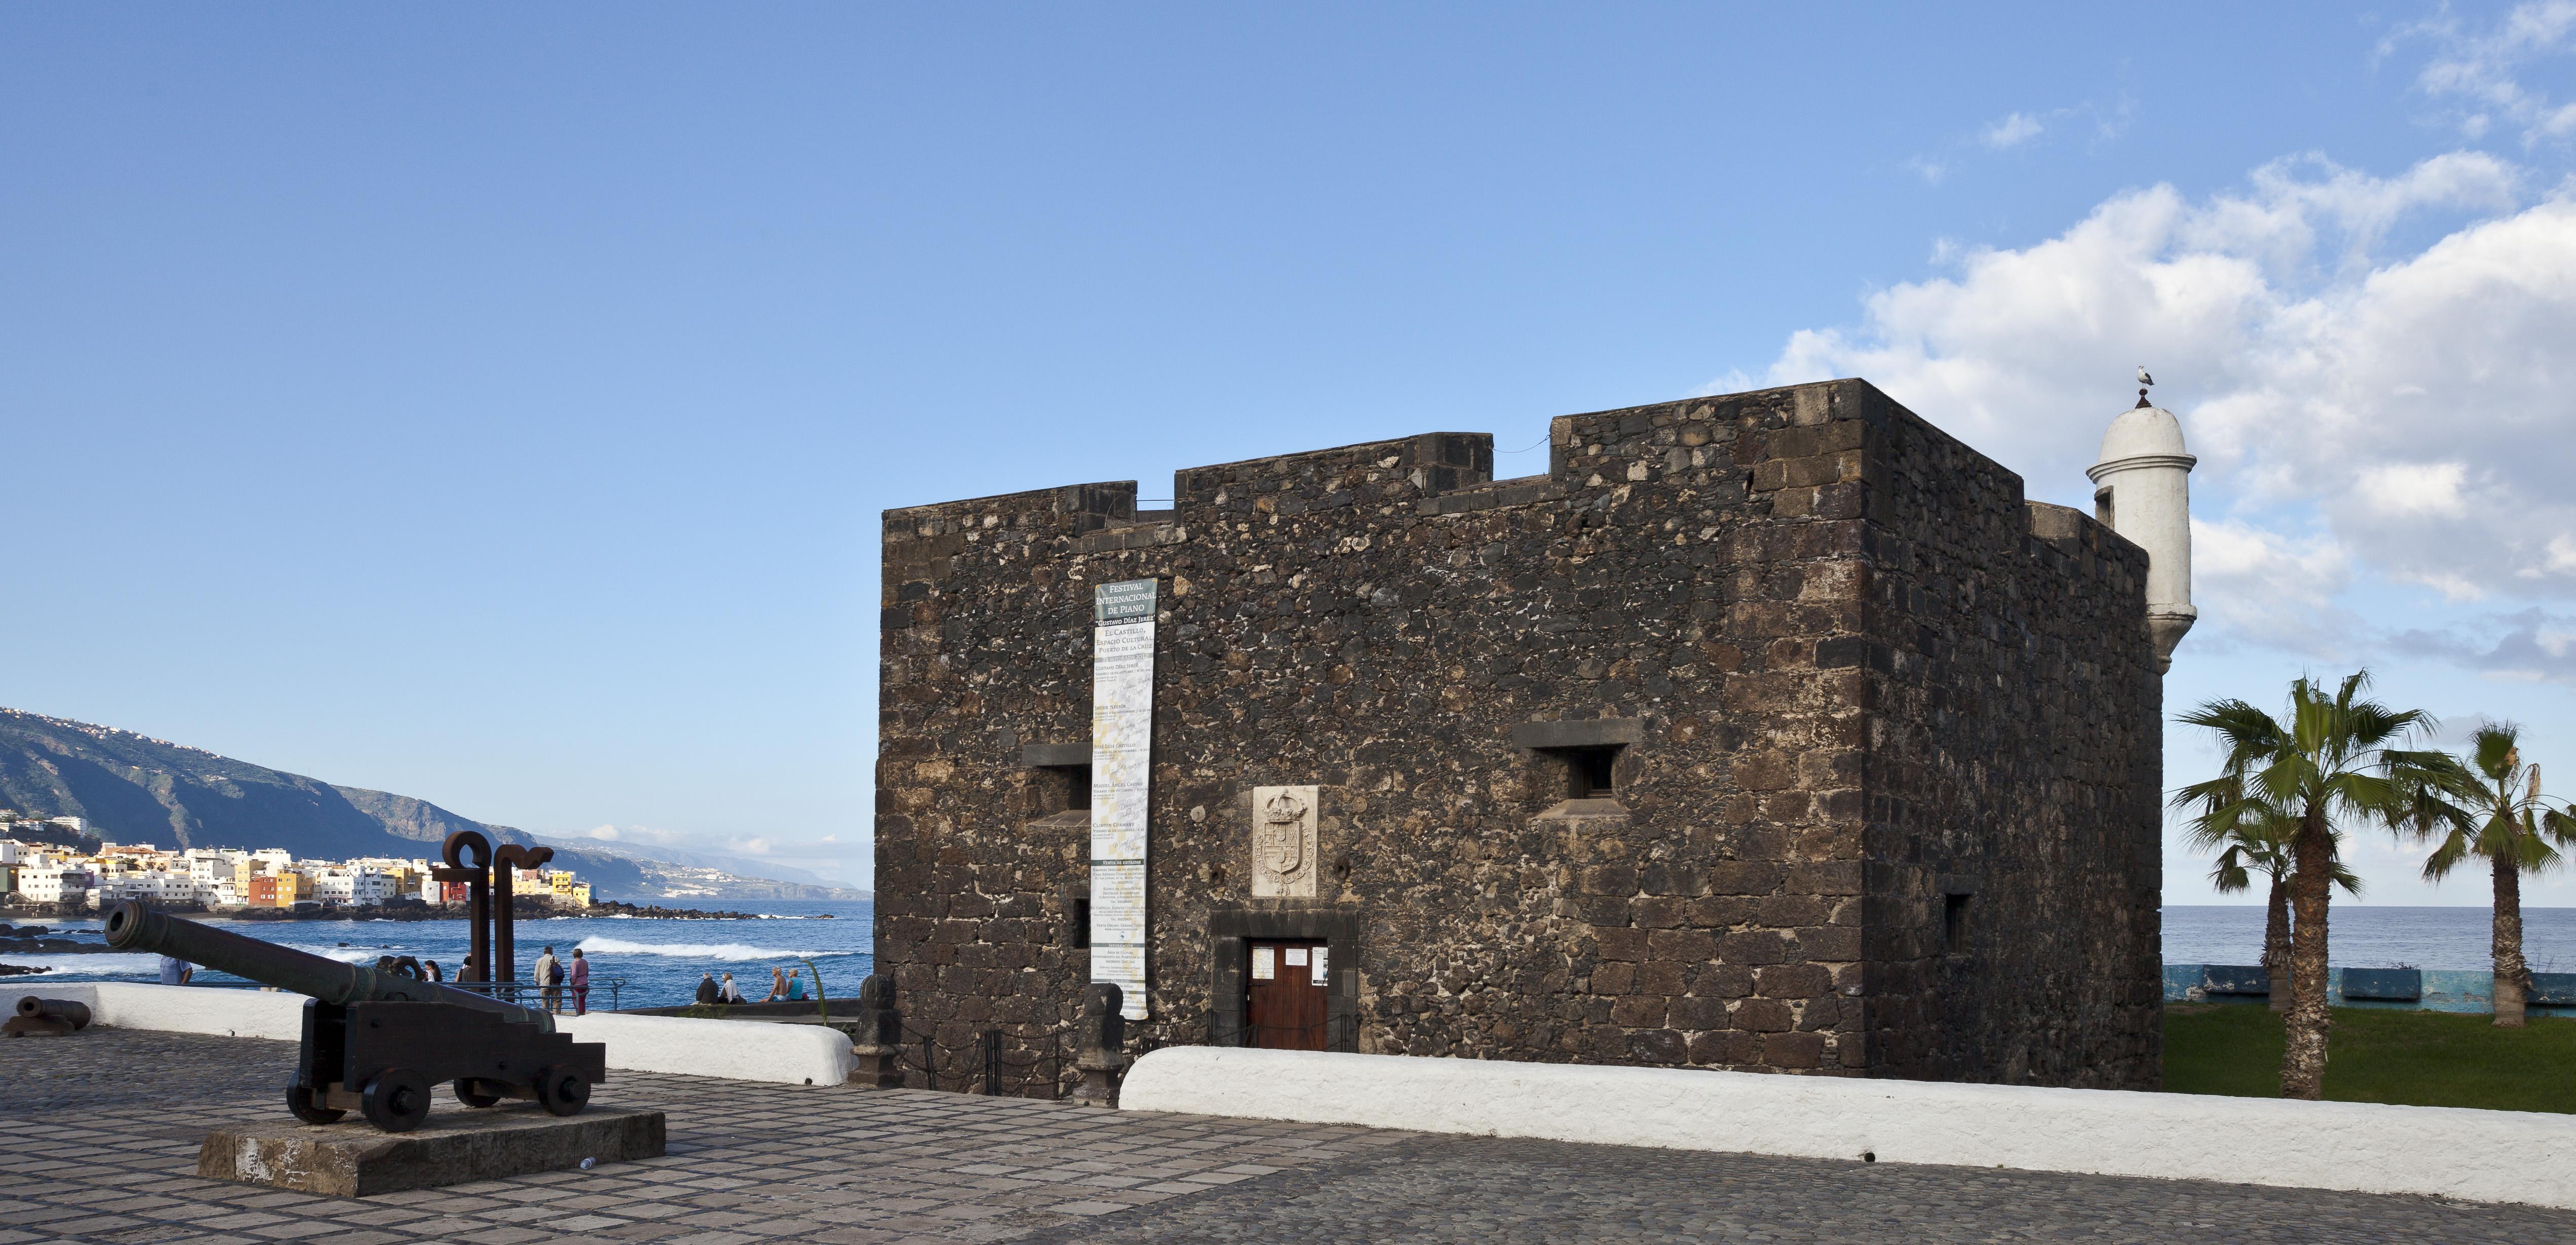 File castillo san felipe puerto de la cruz tenerife espa a 2012 12 13 dd wikimedia - Hotel san felipe tenerife puerto de la cruz ...